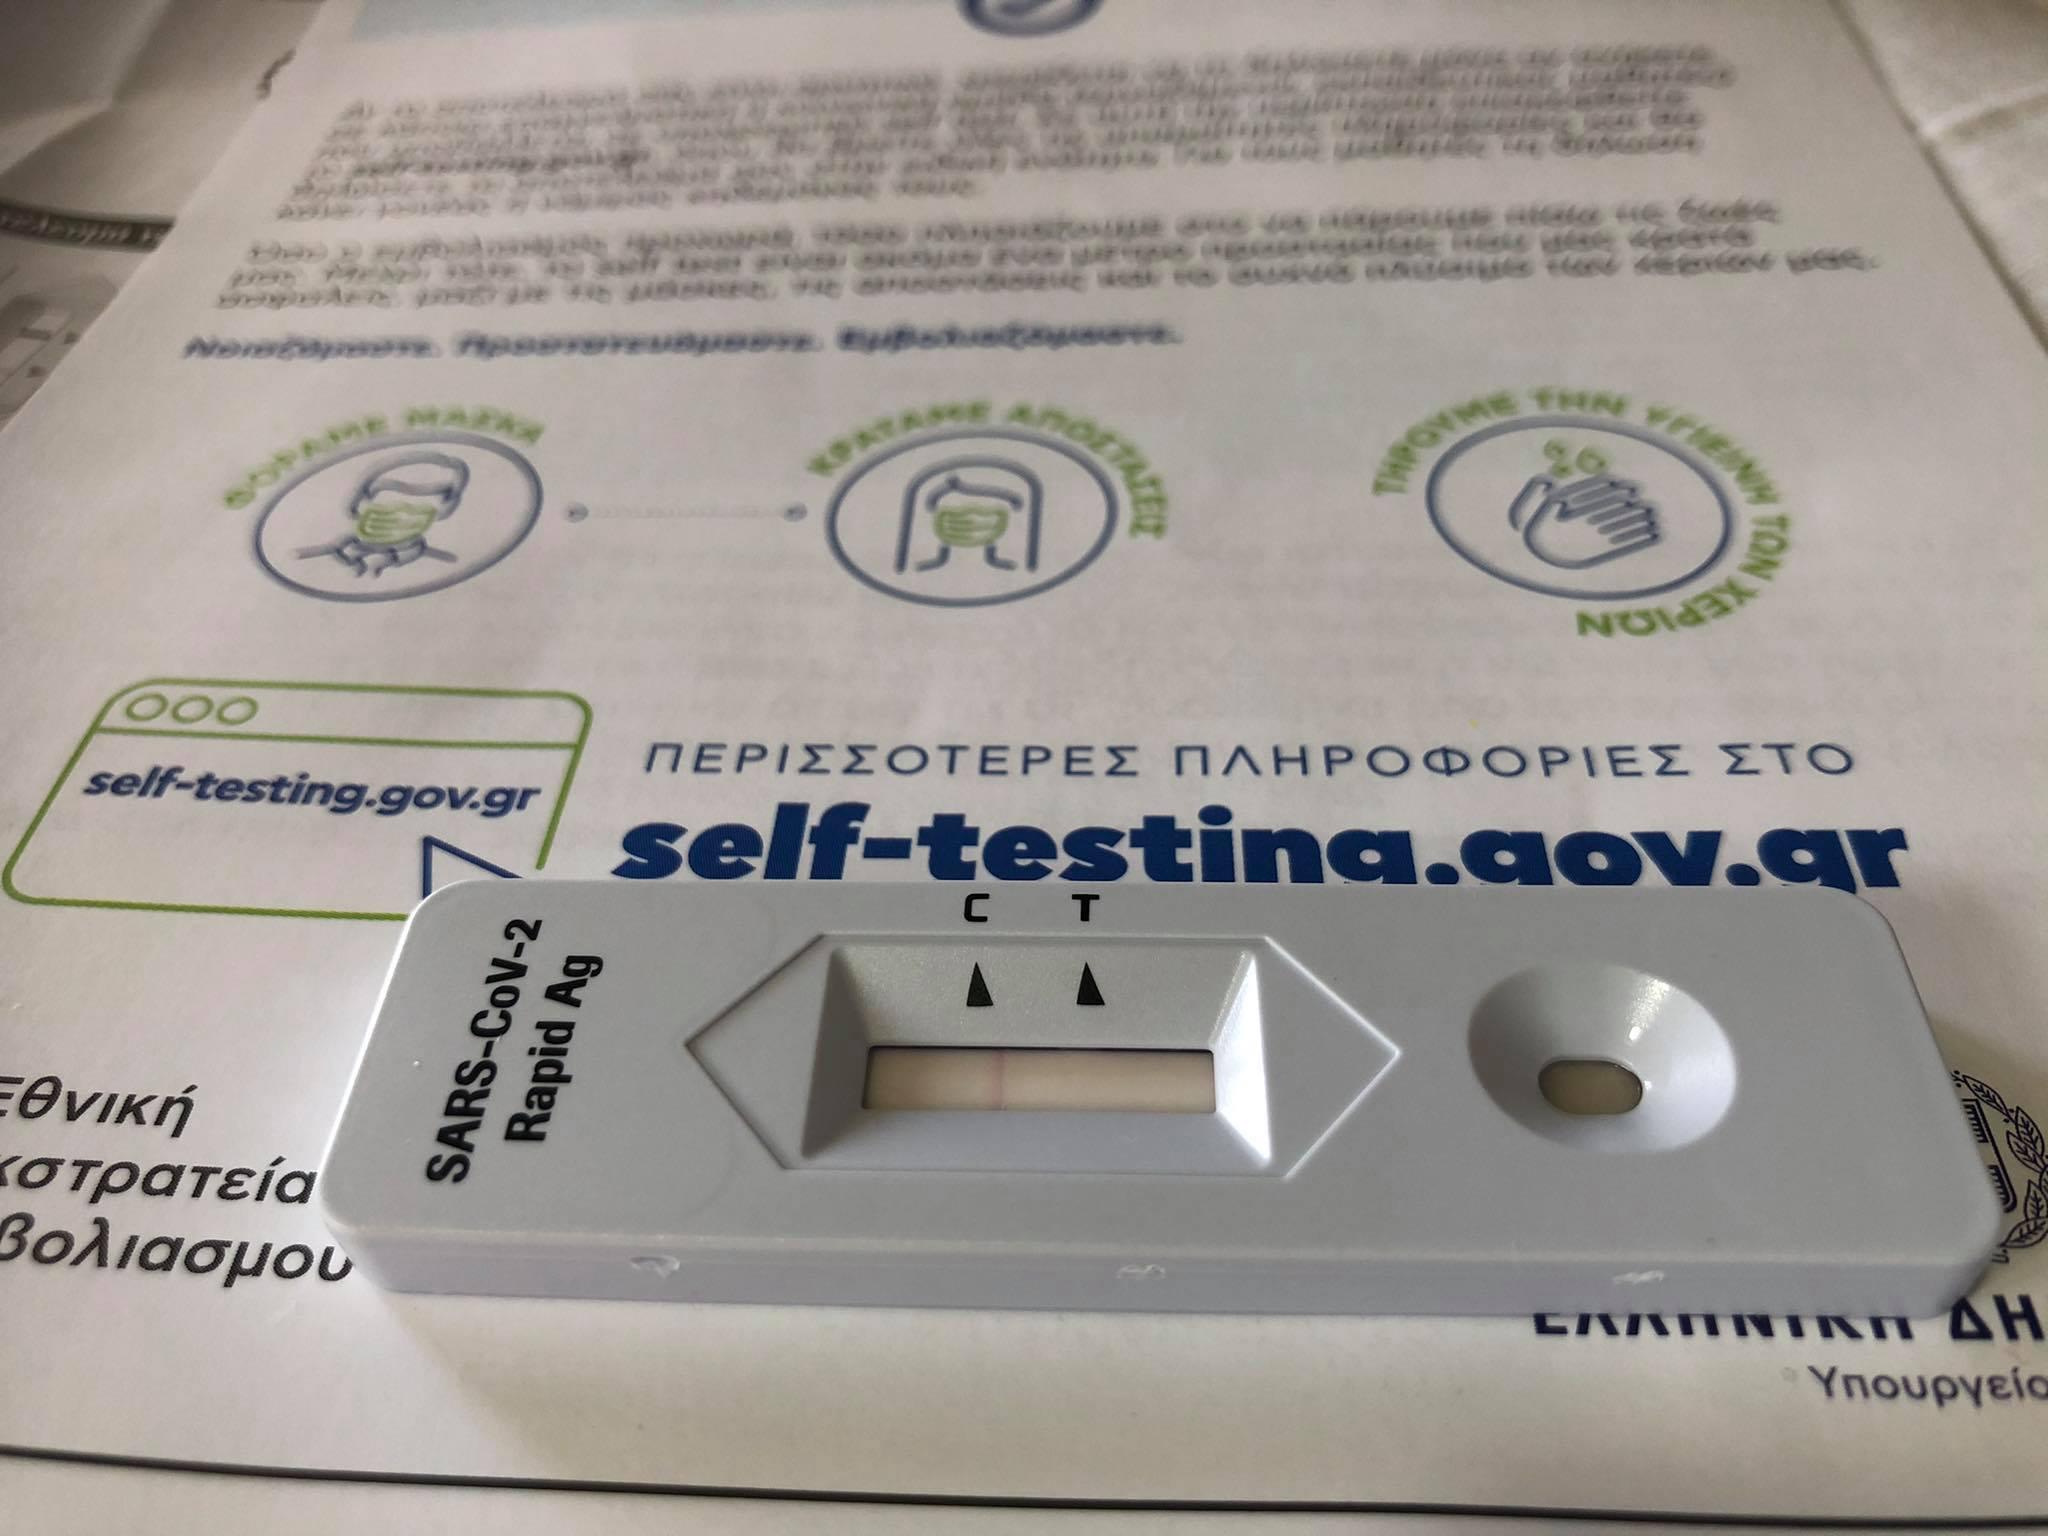 Self test: Επέκταση διάθεσης και στα παιδιά 5 έως 11 ετών.